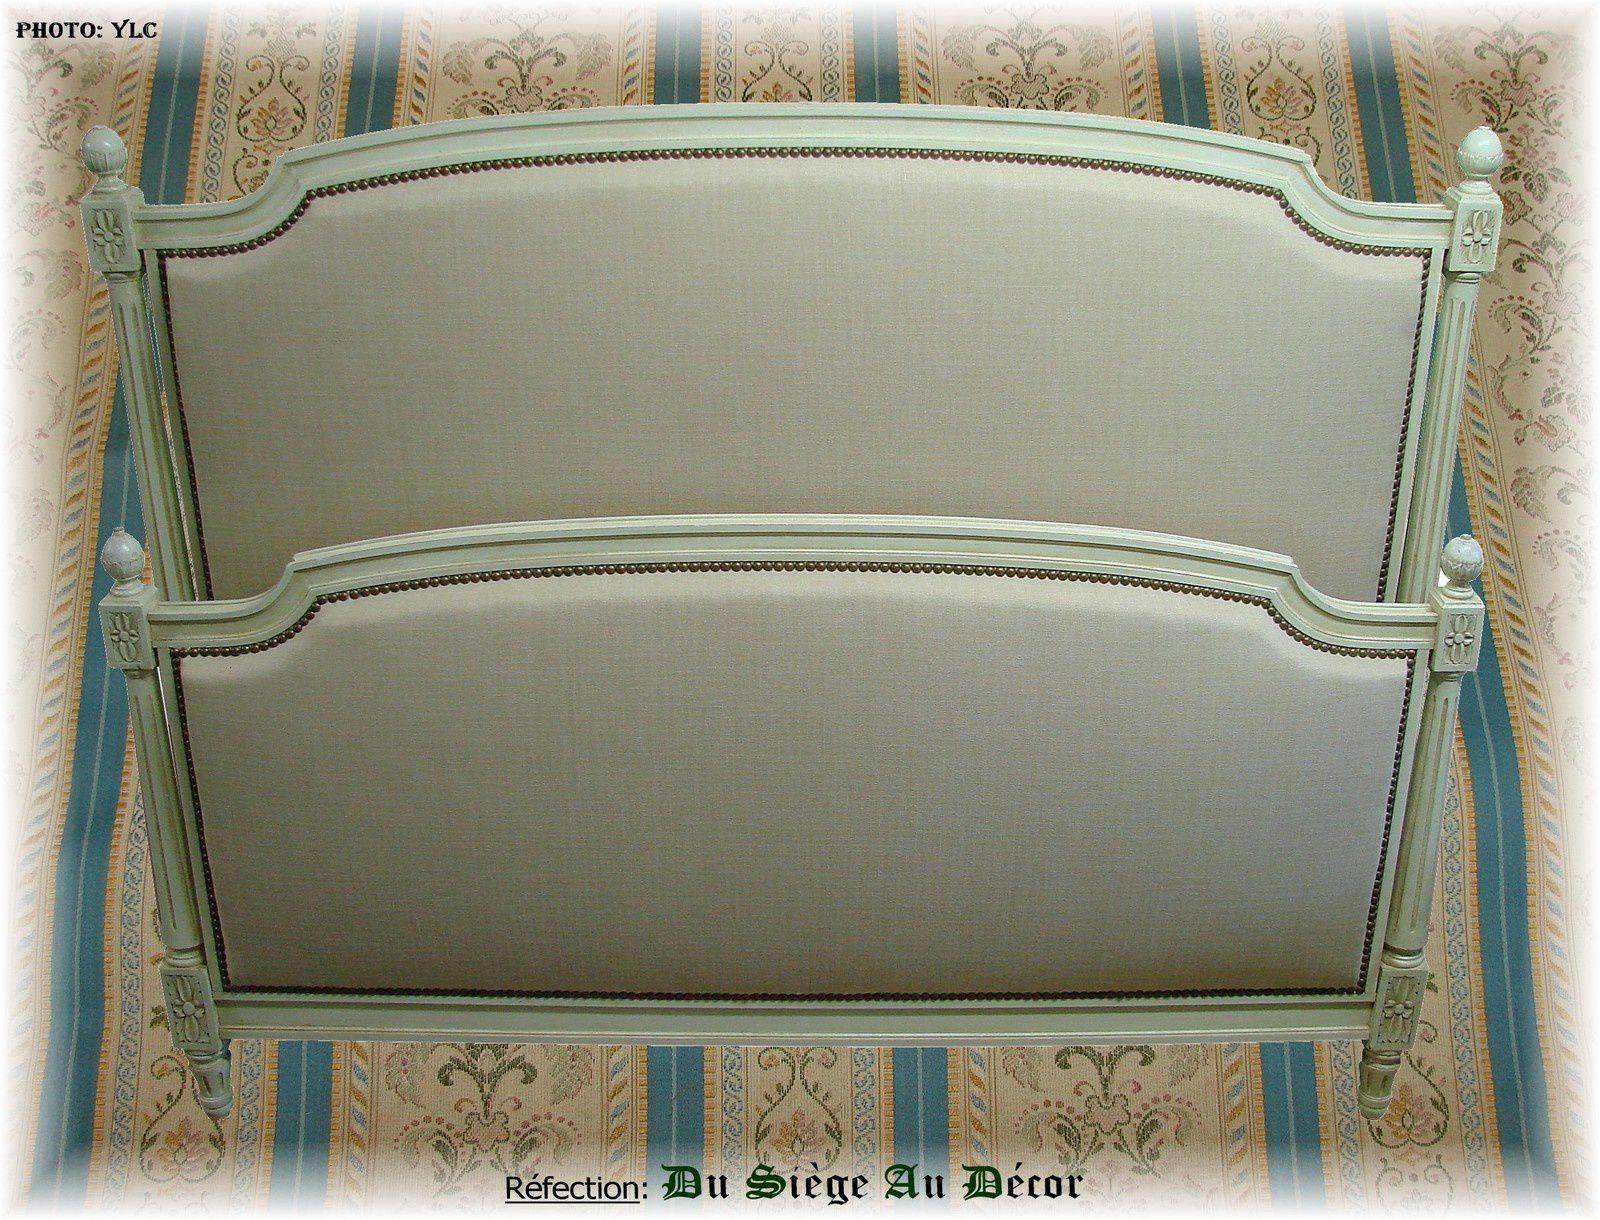 lit style louis xvi. Black Bedroom Furniture Sets. Home Design Ideas